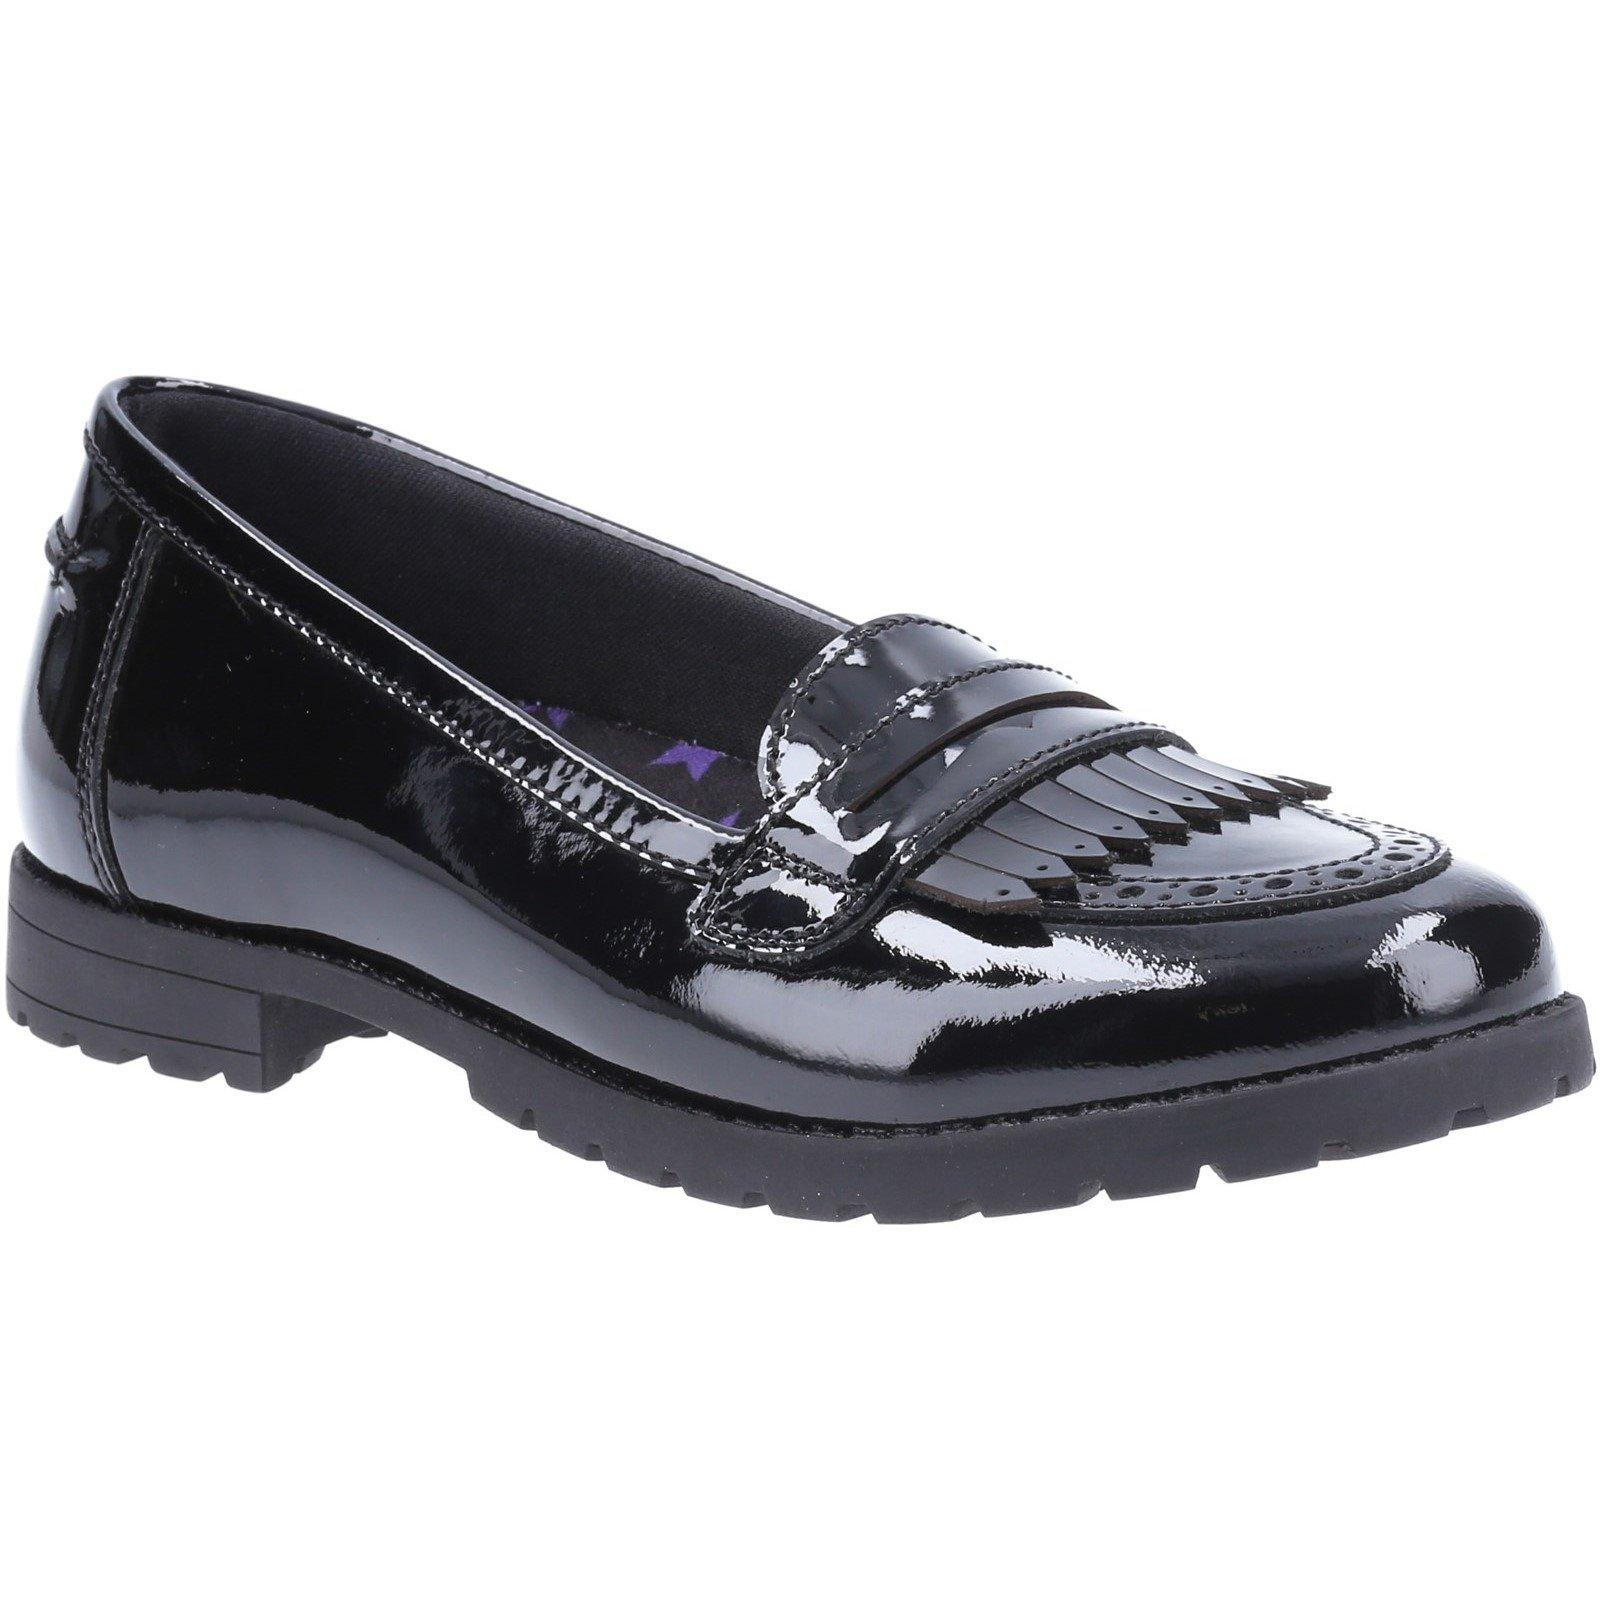 Hush Puppies Kid's Emer Junior School Shoe Patent Black 32595 - Patent Black 13